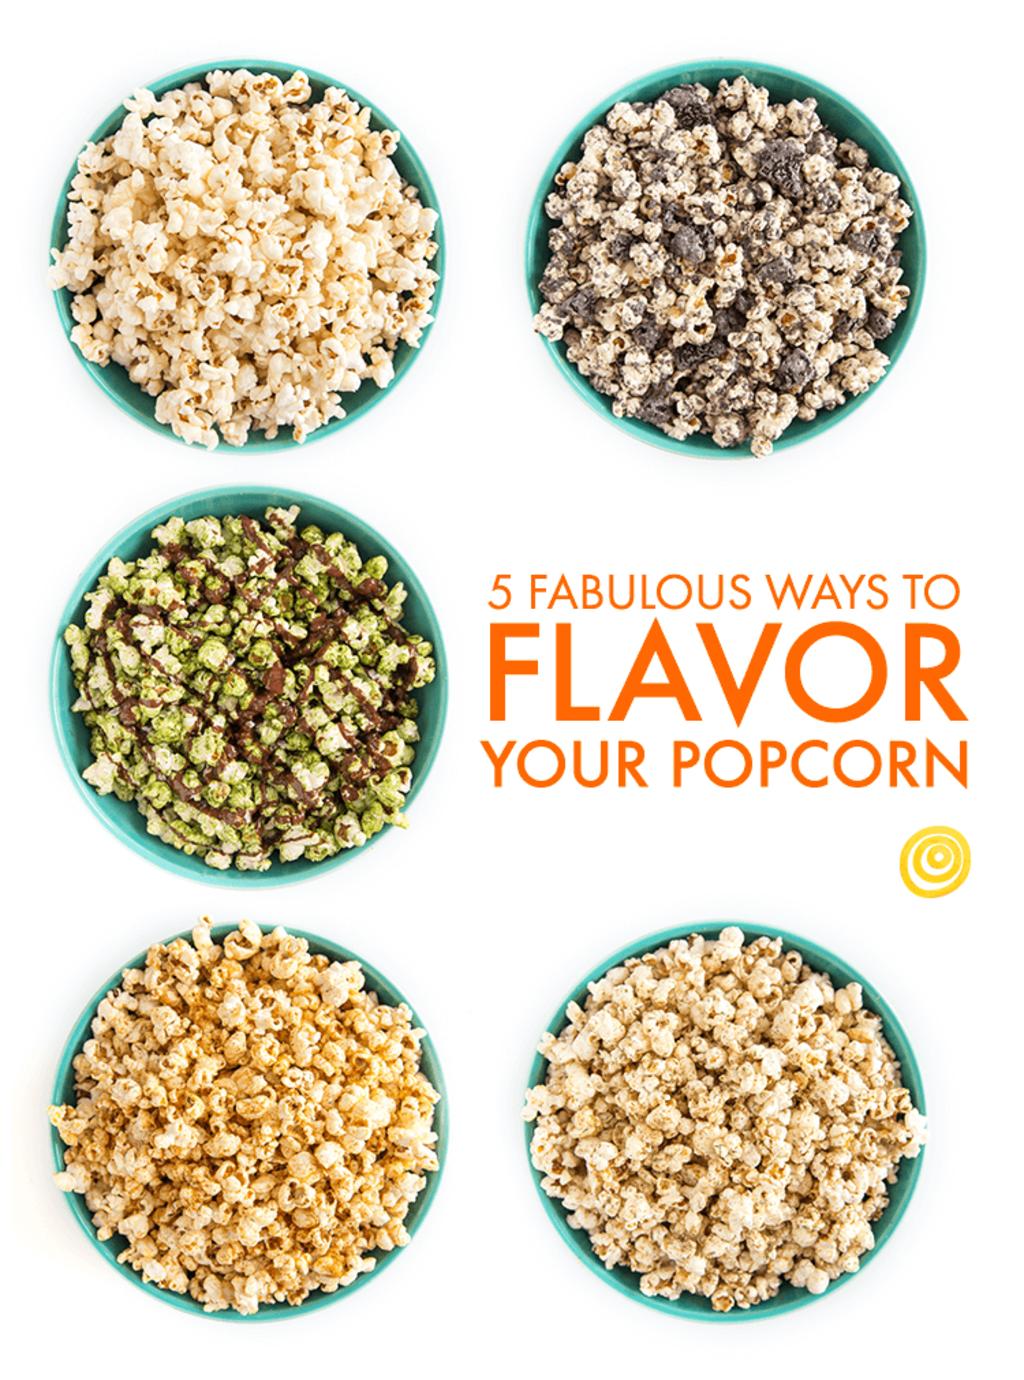 5 Fabulous Ways to Flavor Your Popcorn